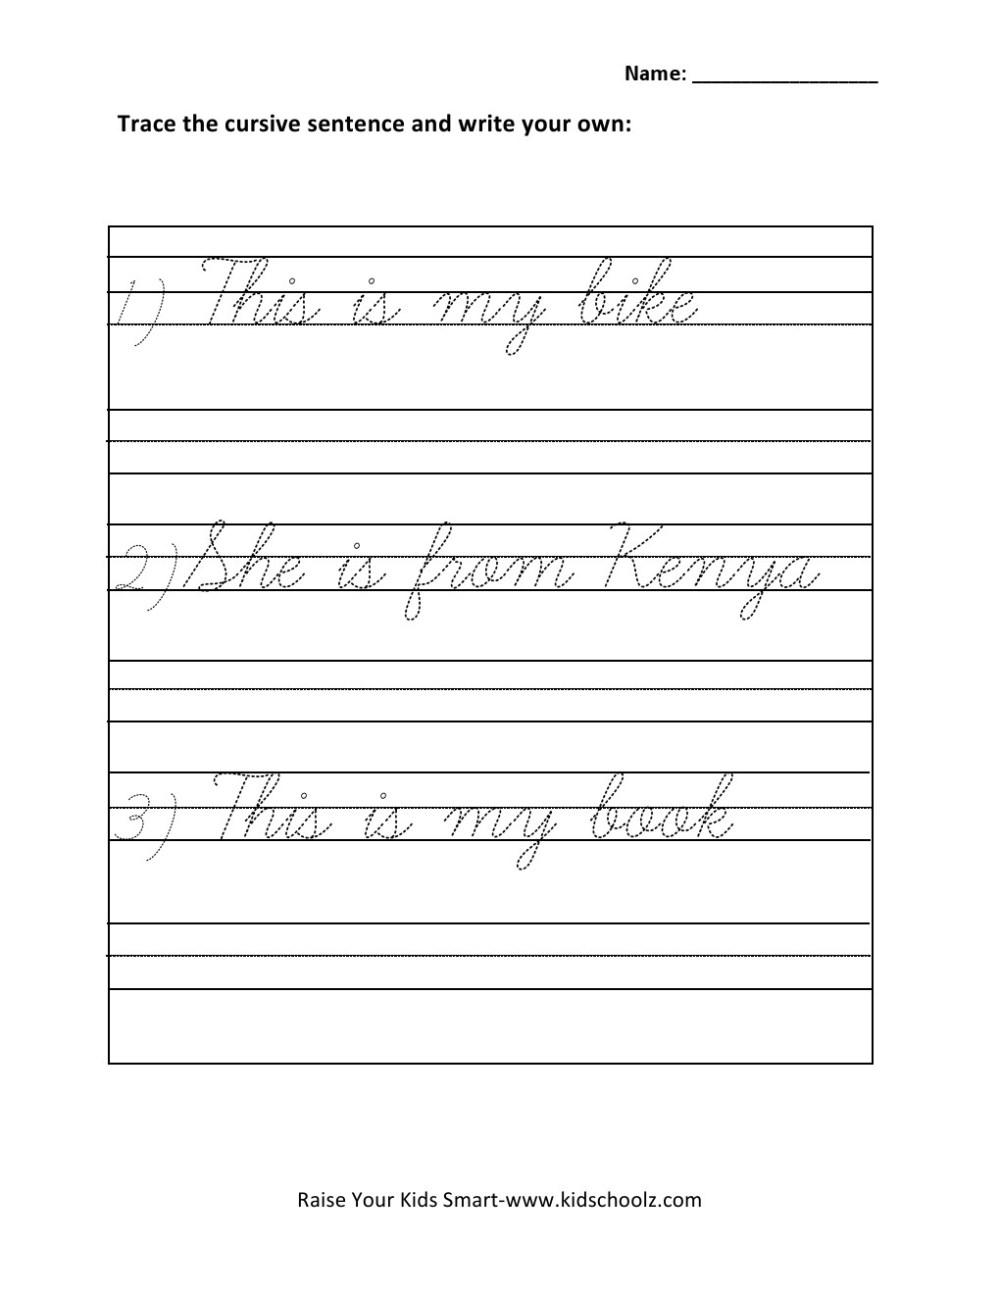 medium resolution of Grade 1 - Cursive Writing Sentences Worksheet 5 - Kidschoolz